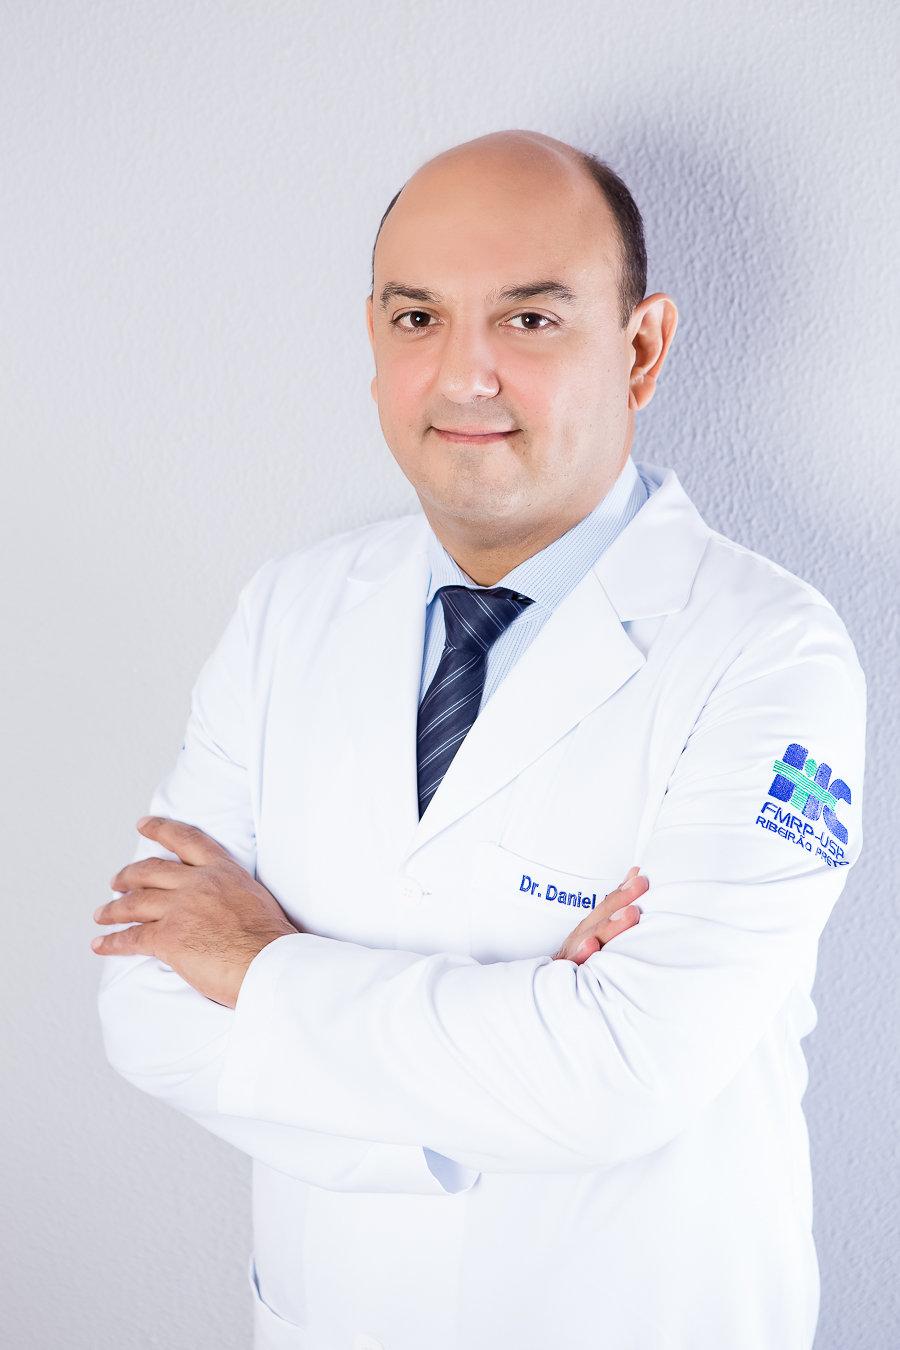 Dr Daniel Giansante Abud